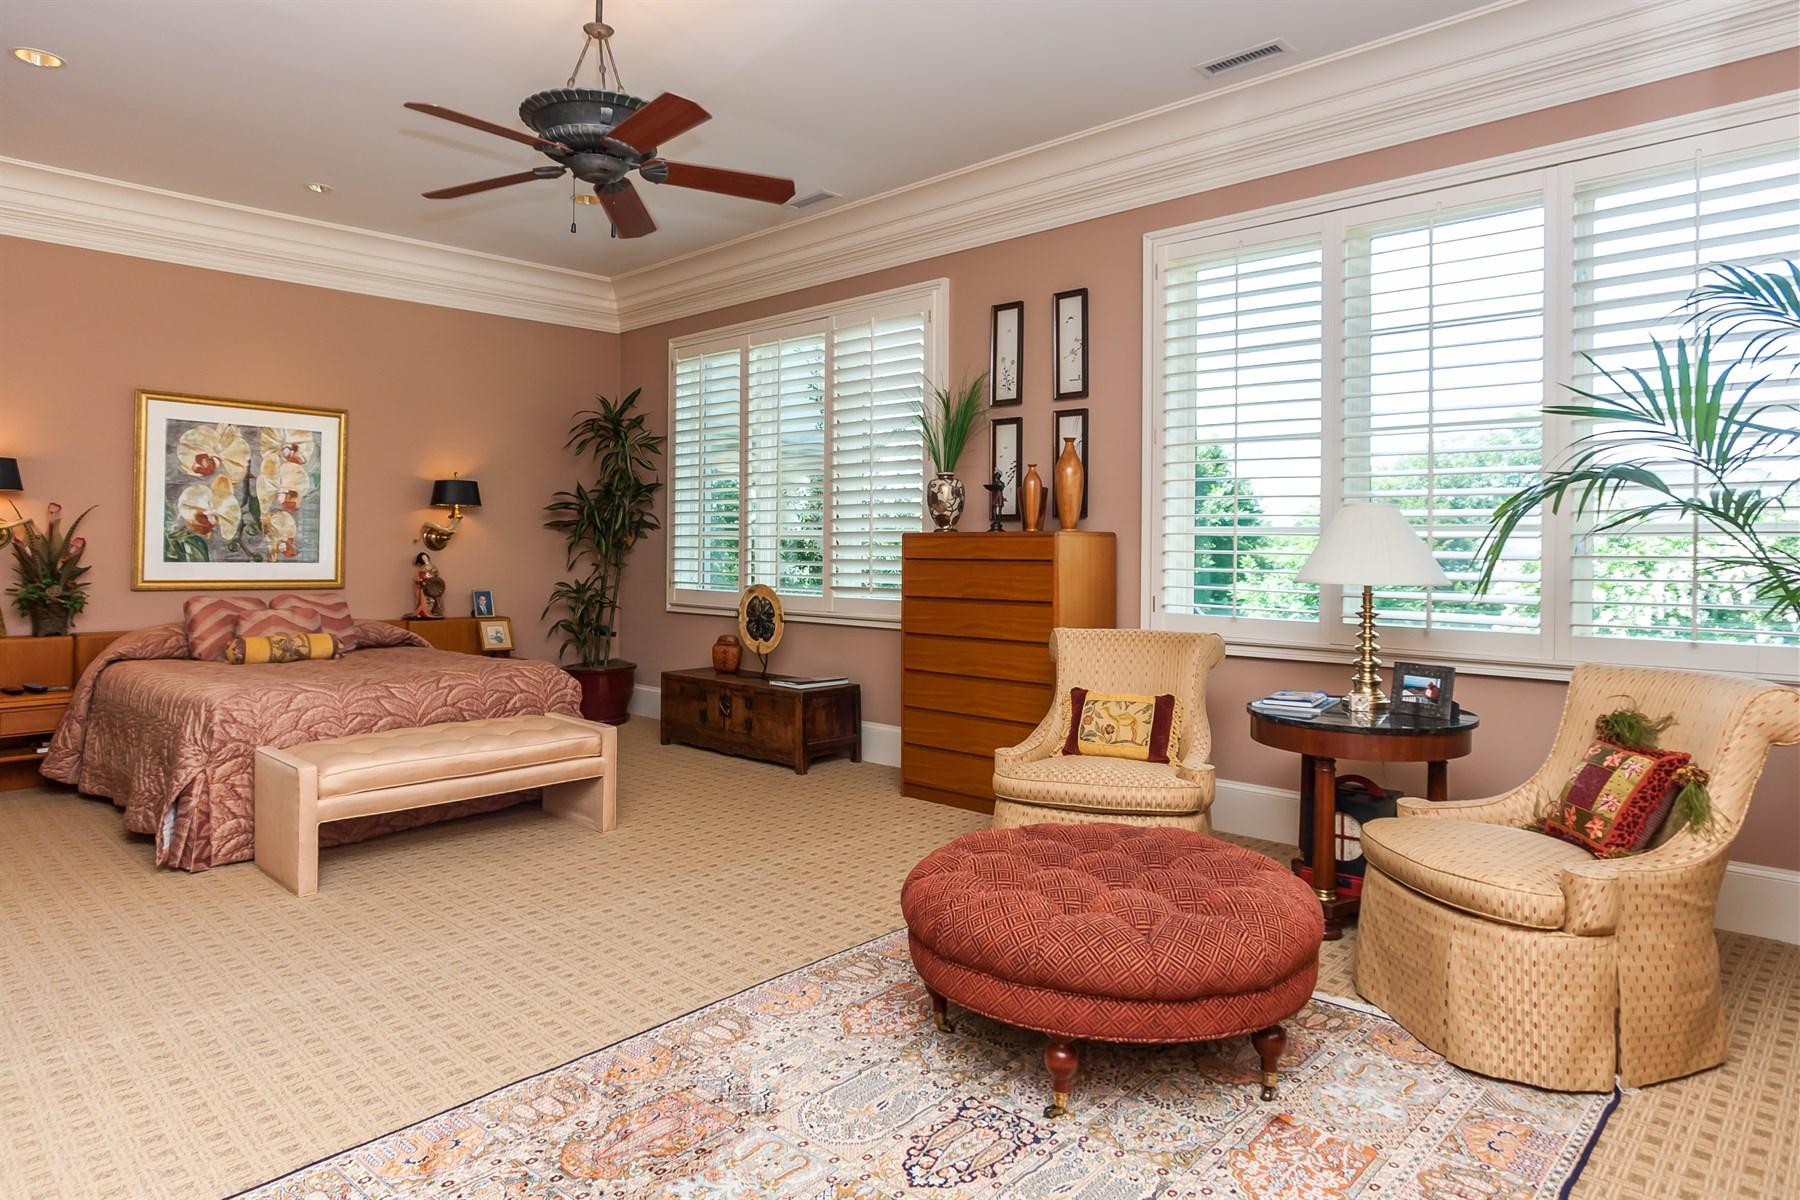 Additional photo for property listing at Bay Leaf Manor Estate 12324 Birchfalls Drive Raleigh, North Carolina 27614 United States